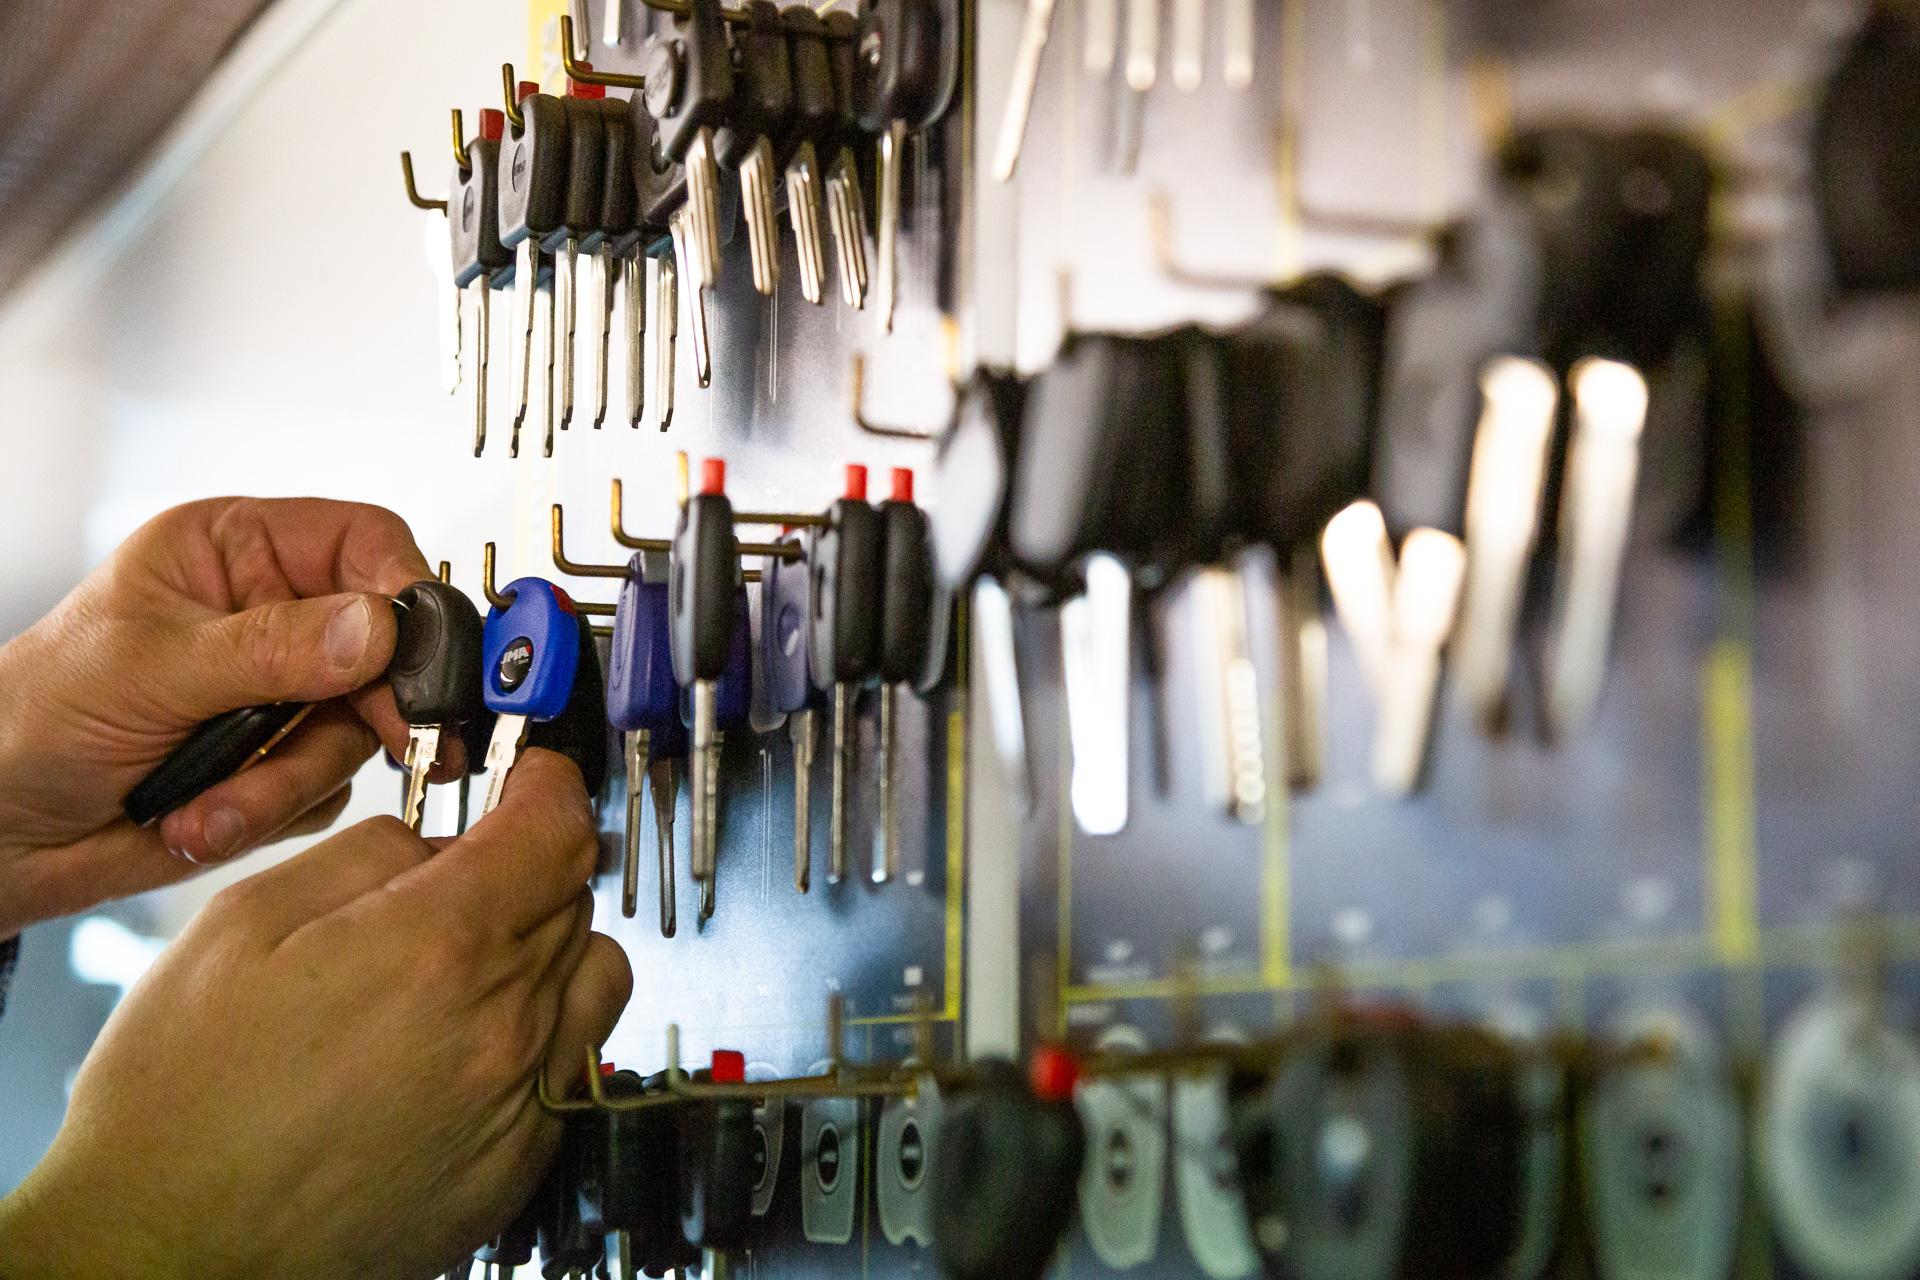 Key Cutting, Coding, Programming, Repairing and Refurbishing!